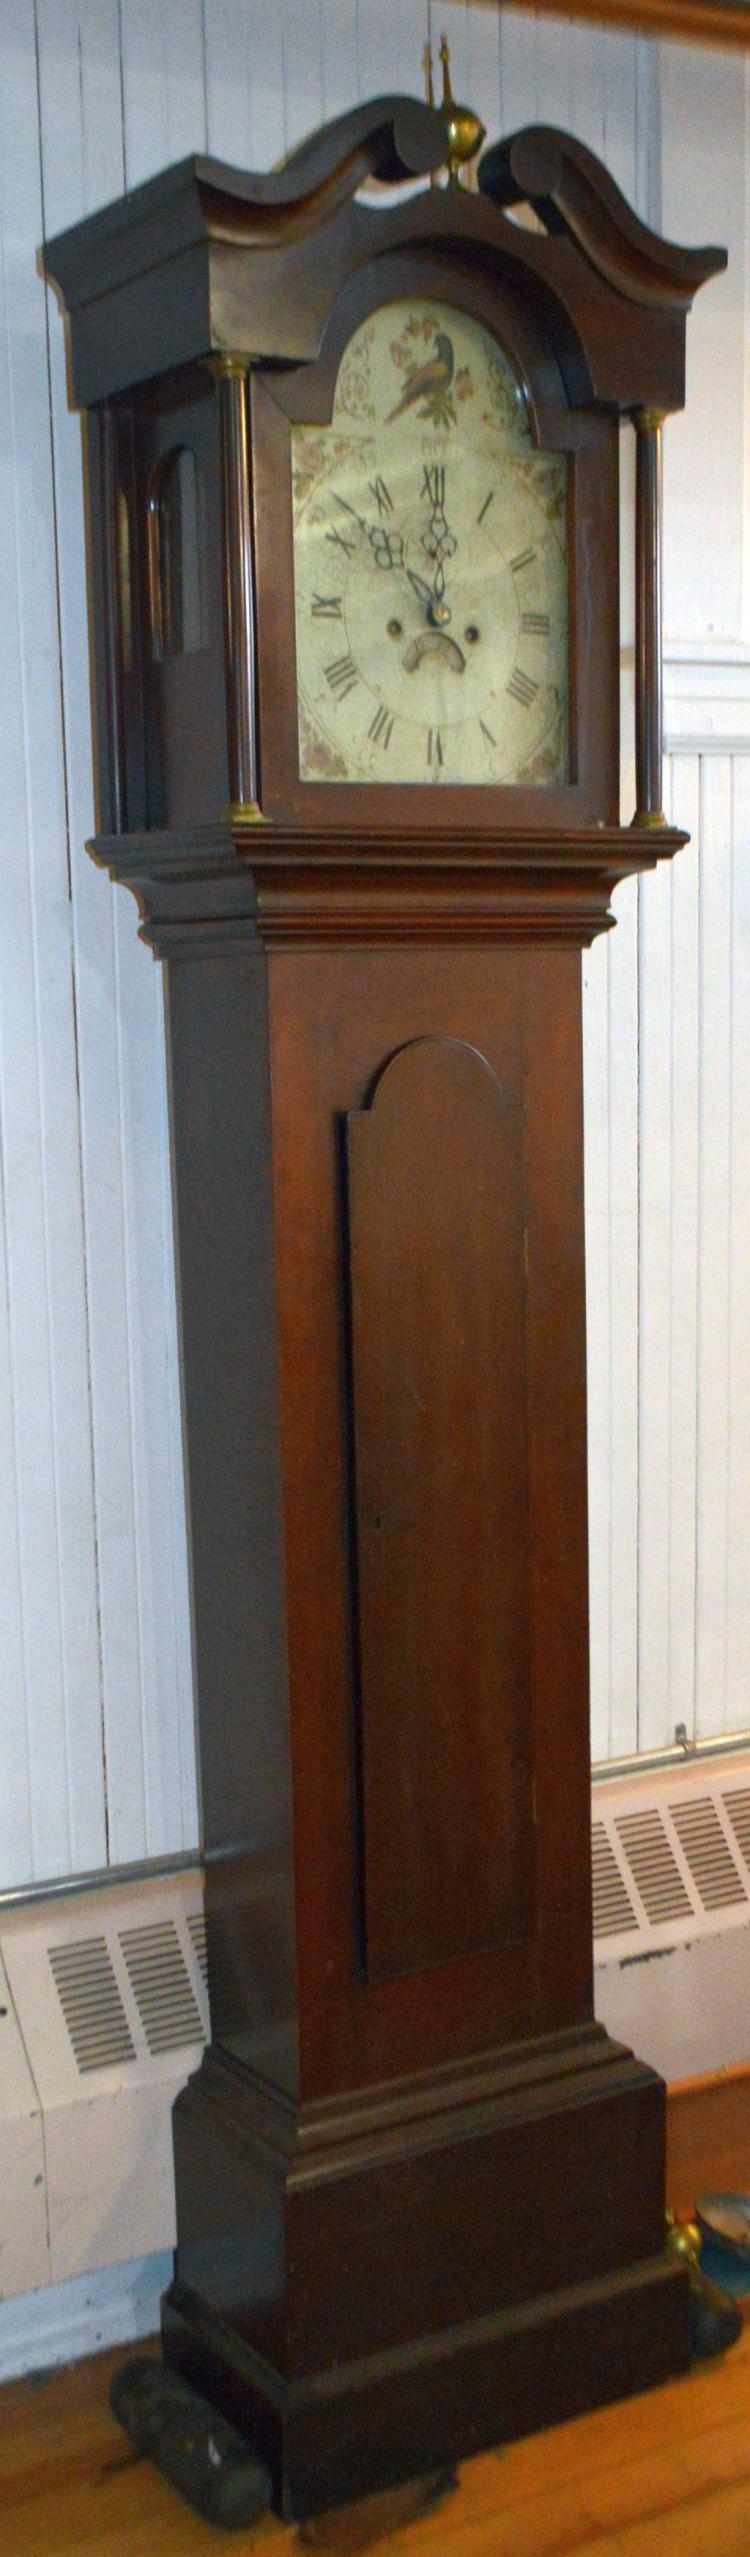 New Hampshire Tall Case Clock